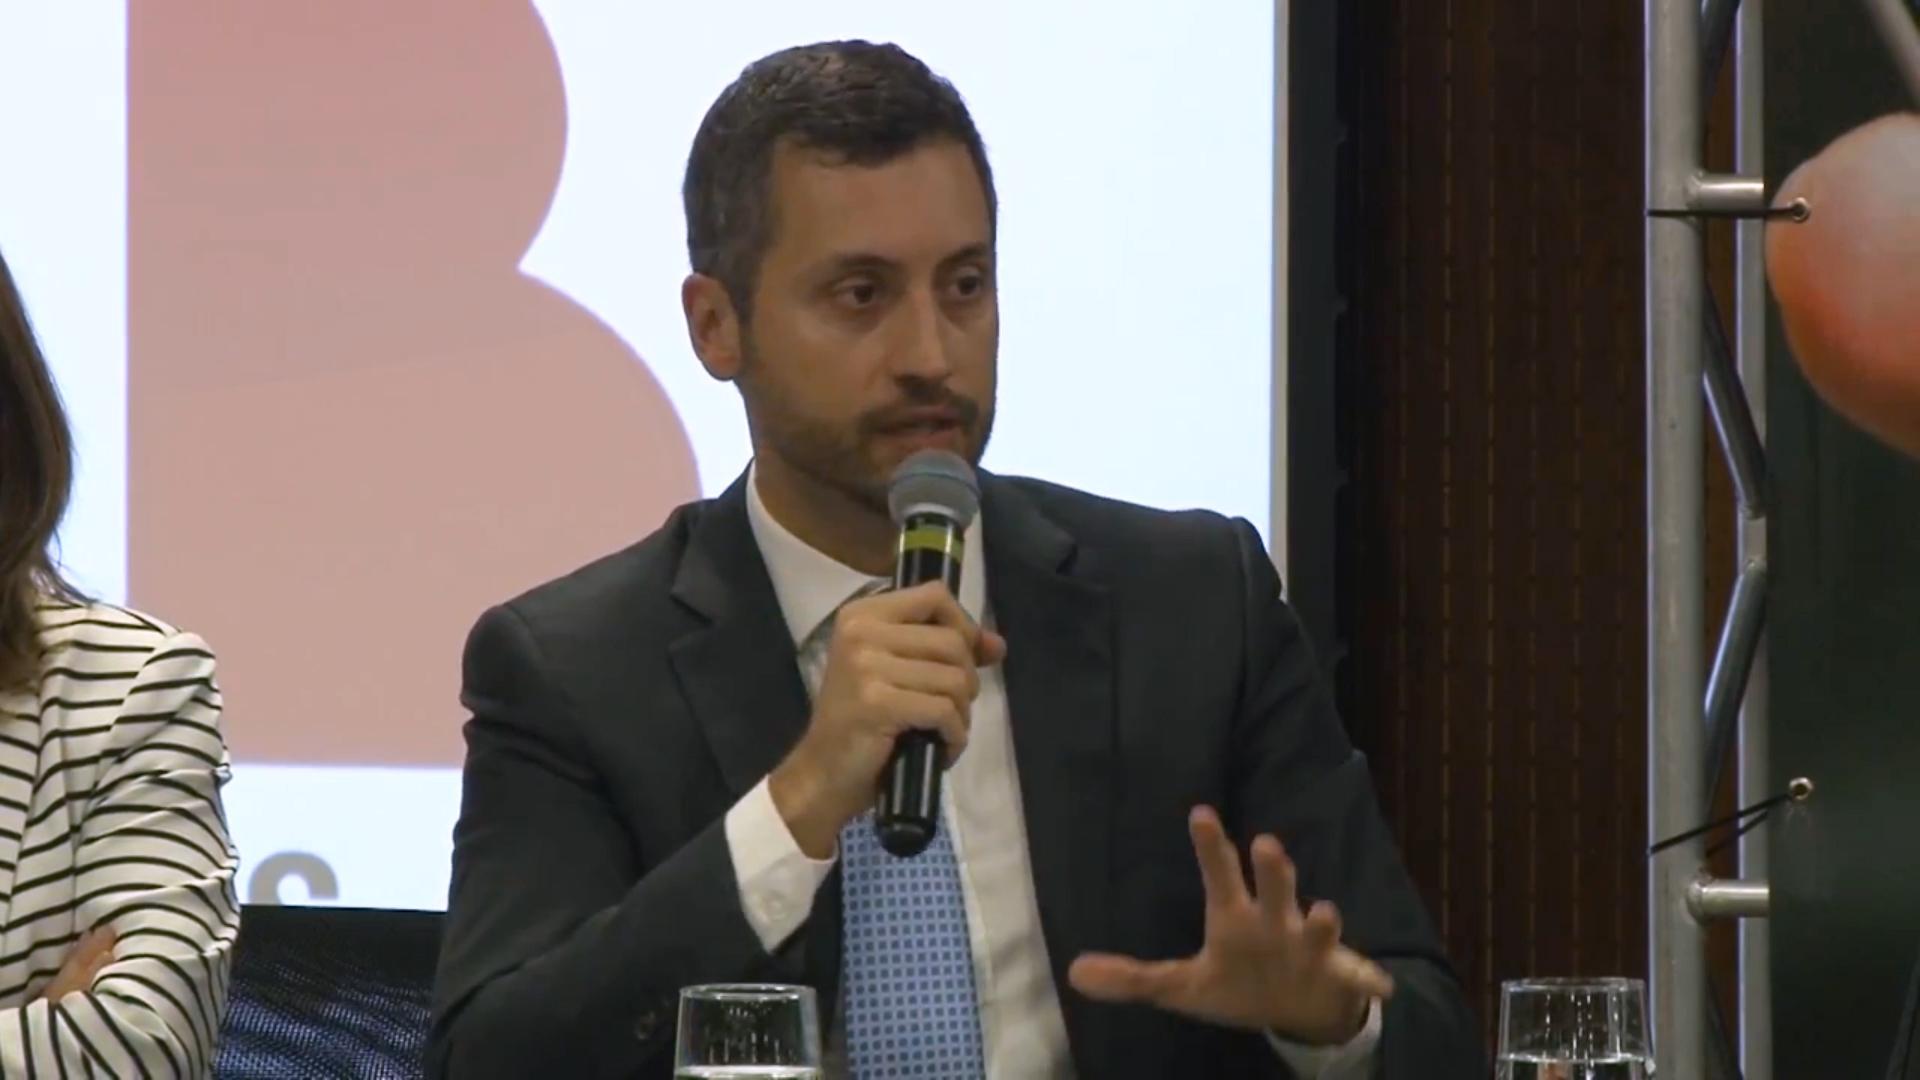 Prof. Dr. Fabrício Bertini Pasquot Polido